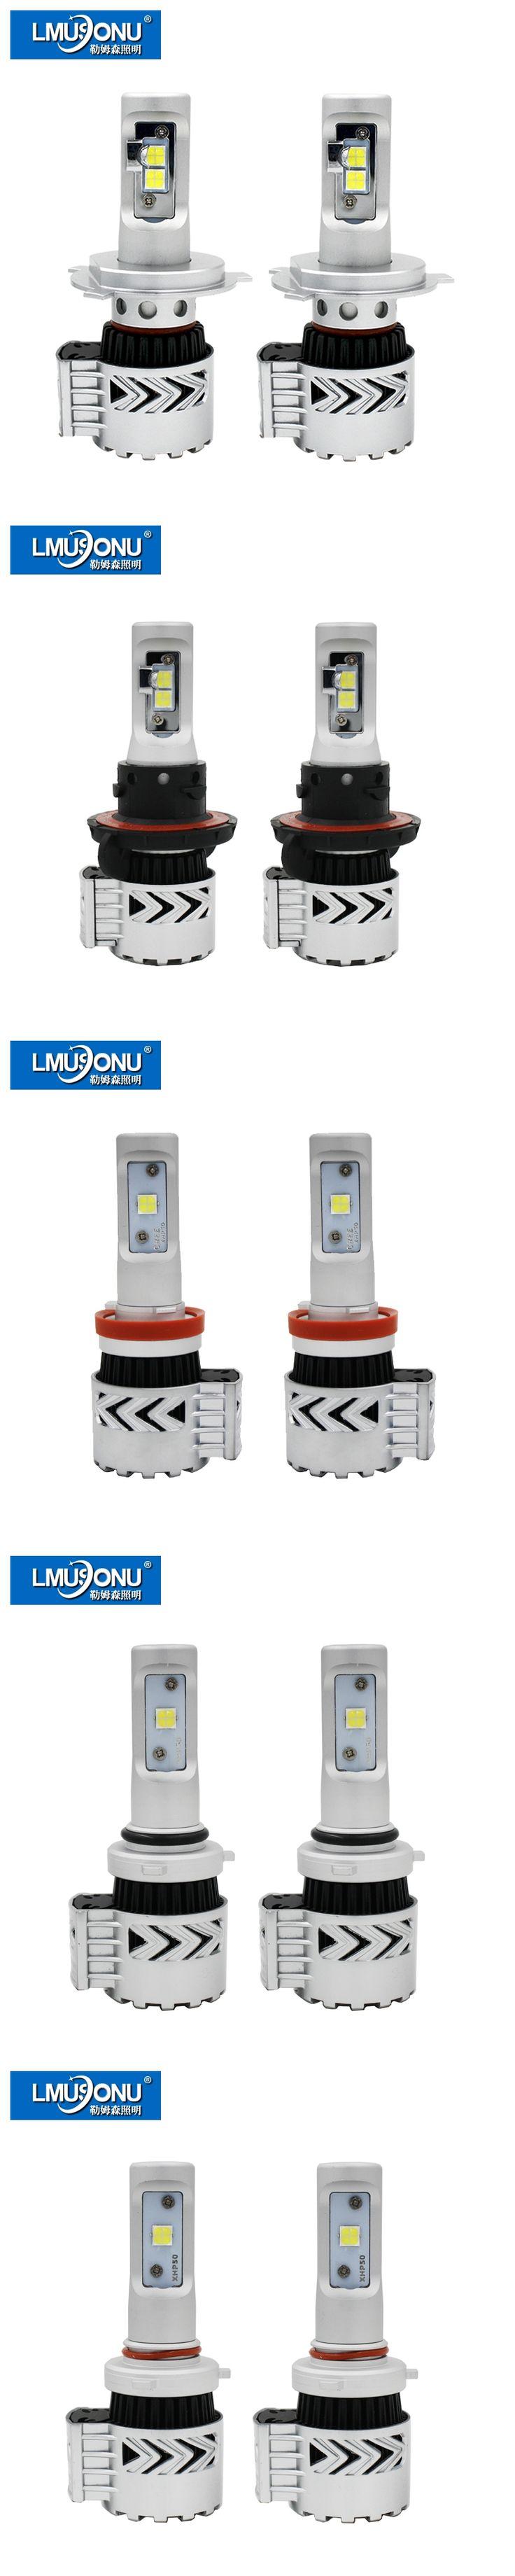 LMUSONU 6000lm 8G LED Car Headlight Super Bright 9005 9006 9007 H4 H7 H11 H13 Automotives Headlamp